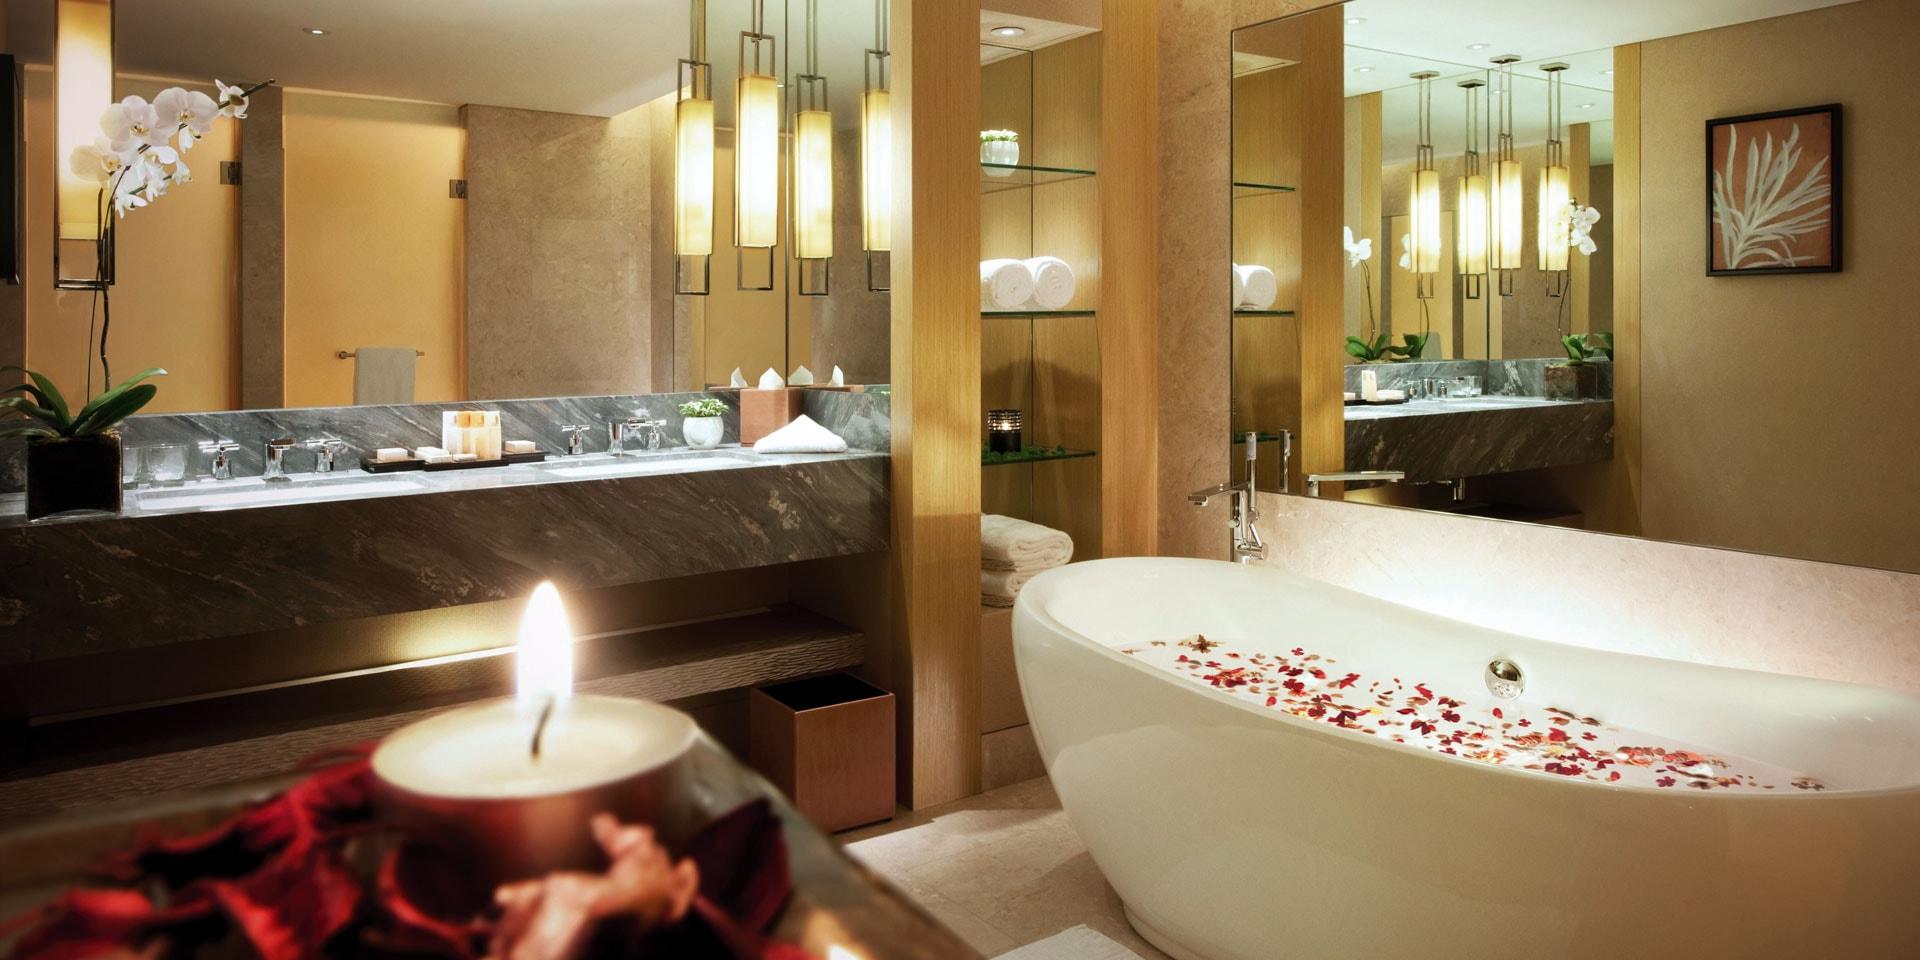 Club Room In Marina Bay Sands Singapore Hotel